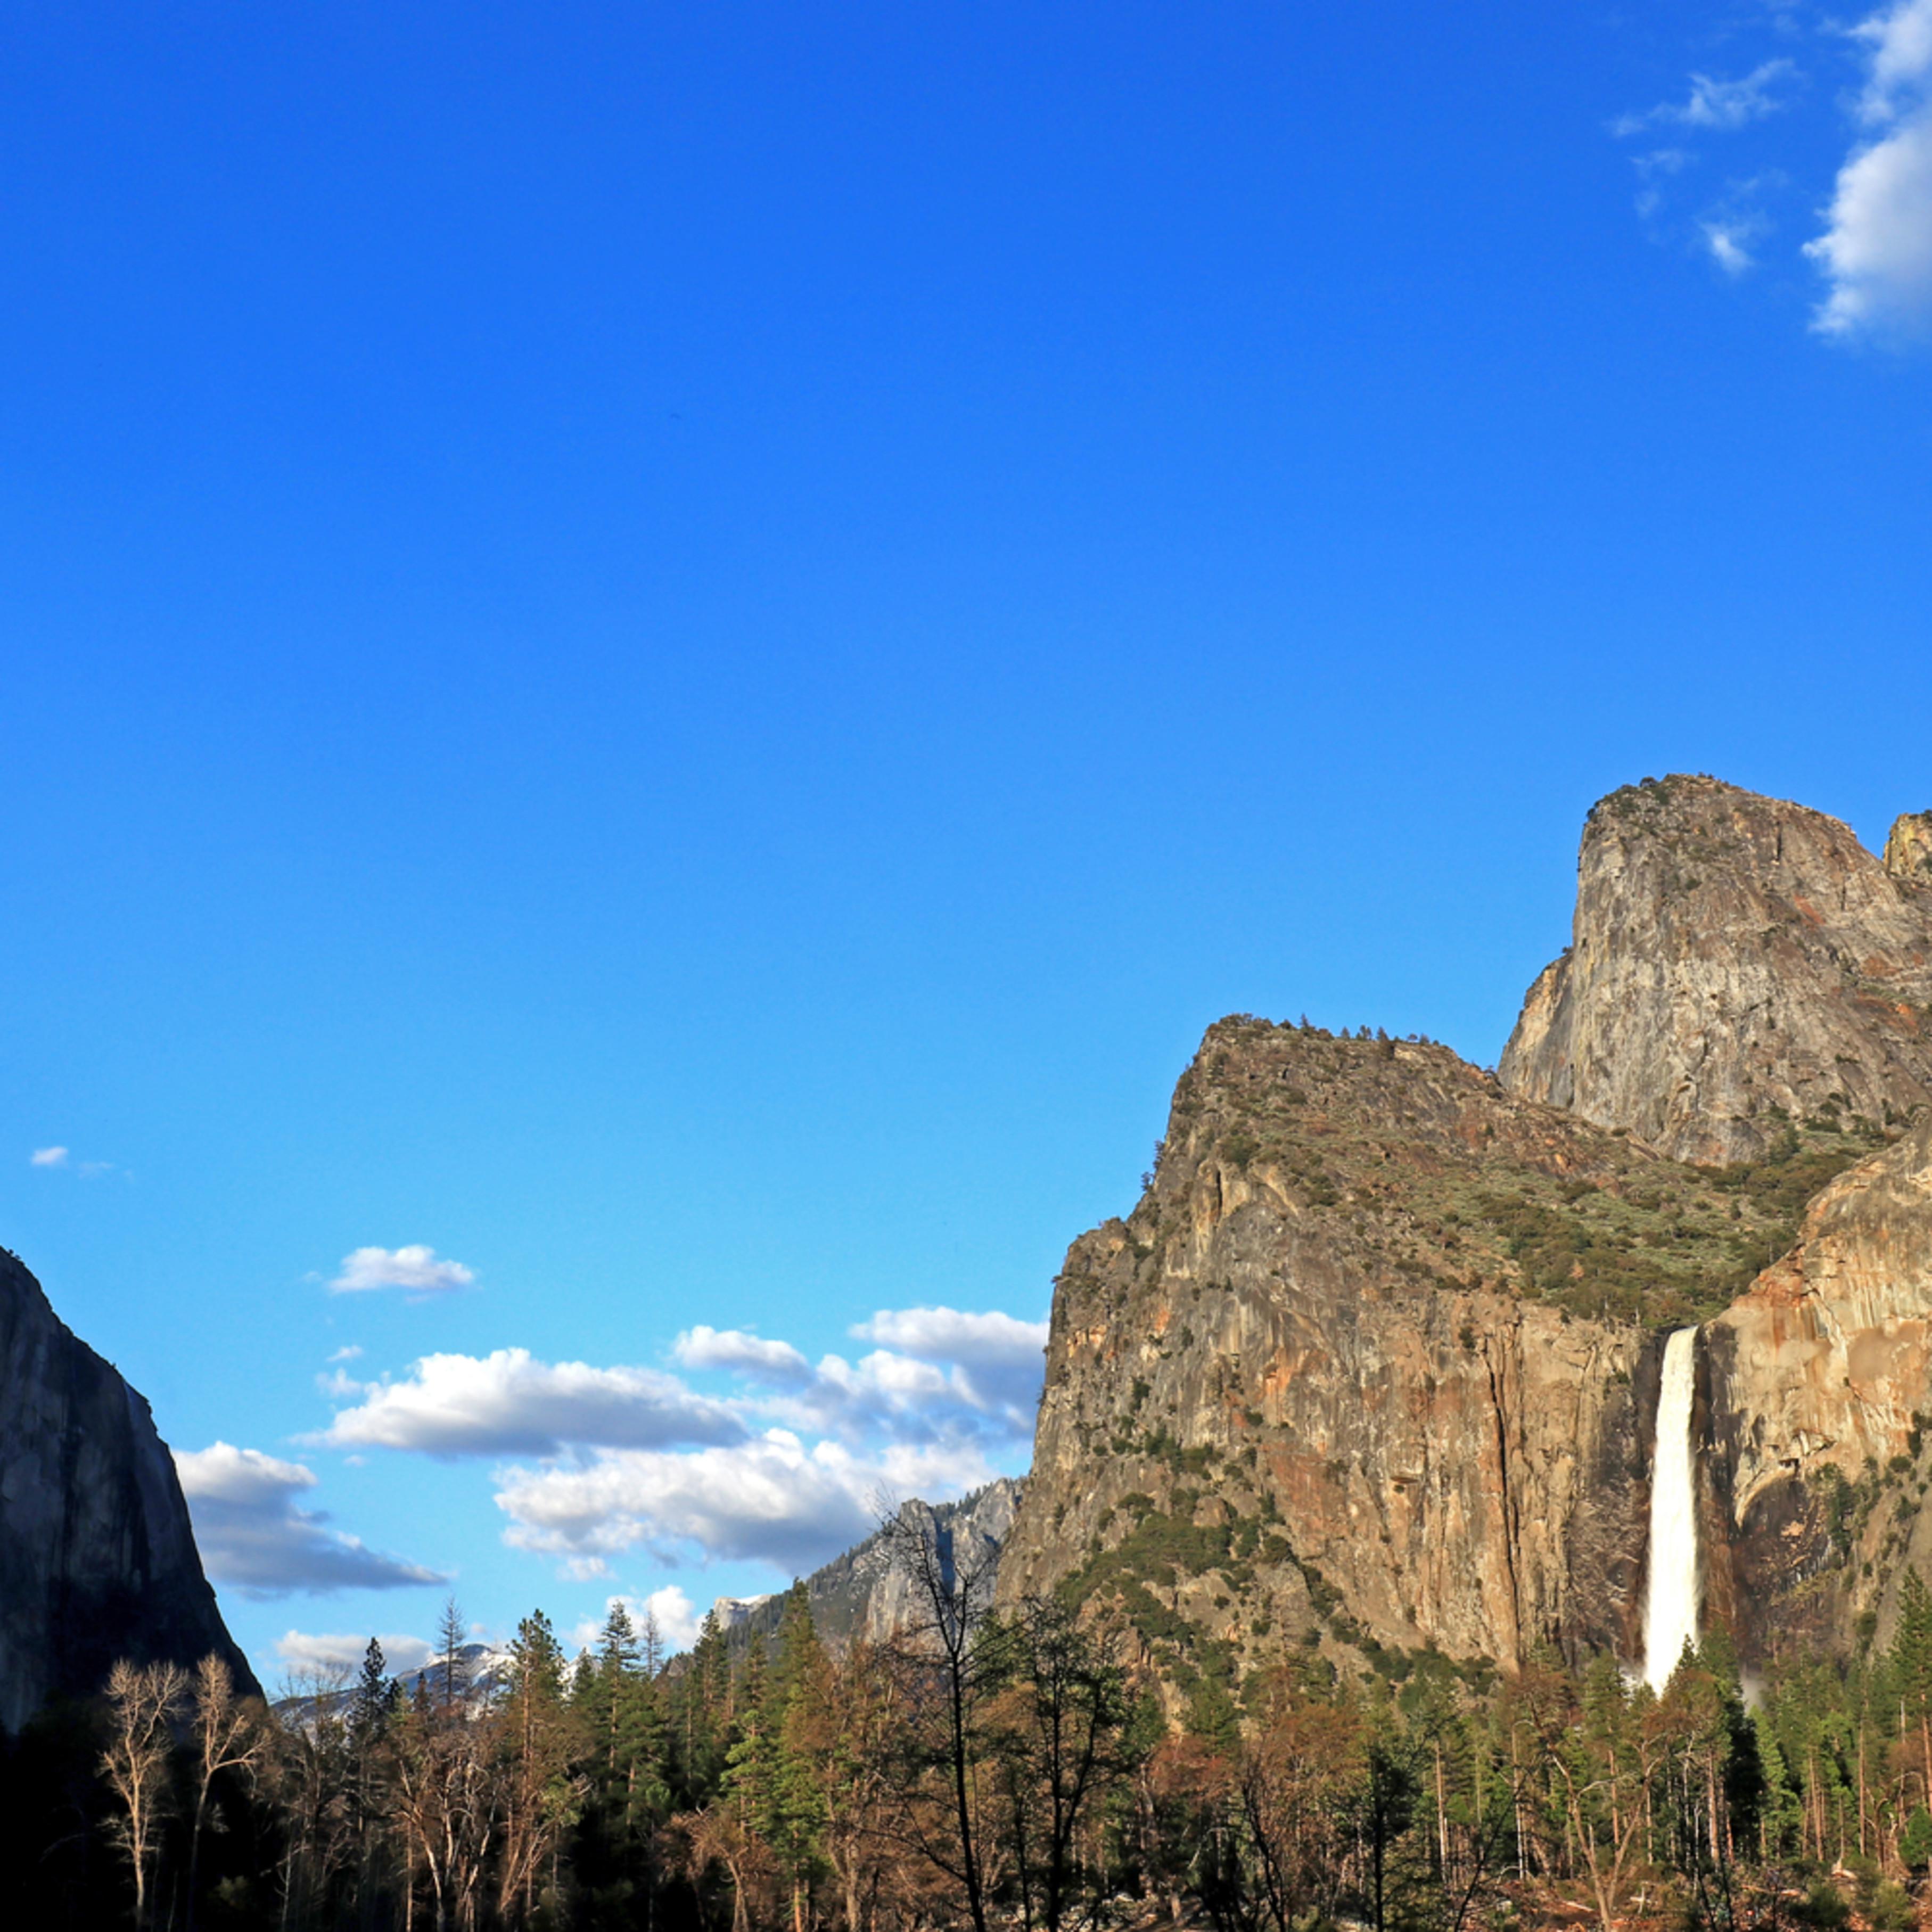 Yosemite sunset at valley view wap2k8